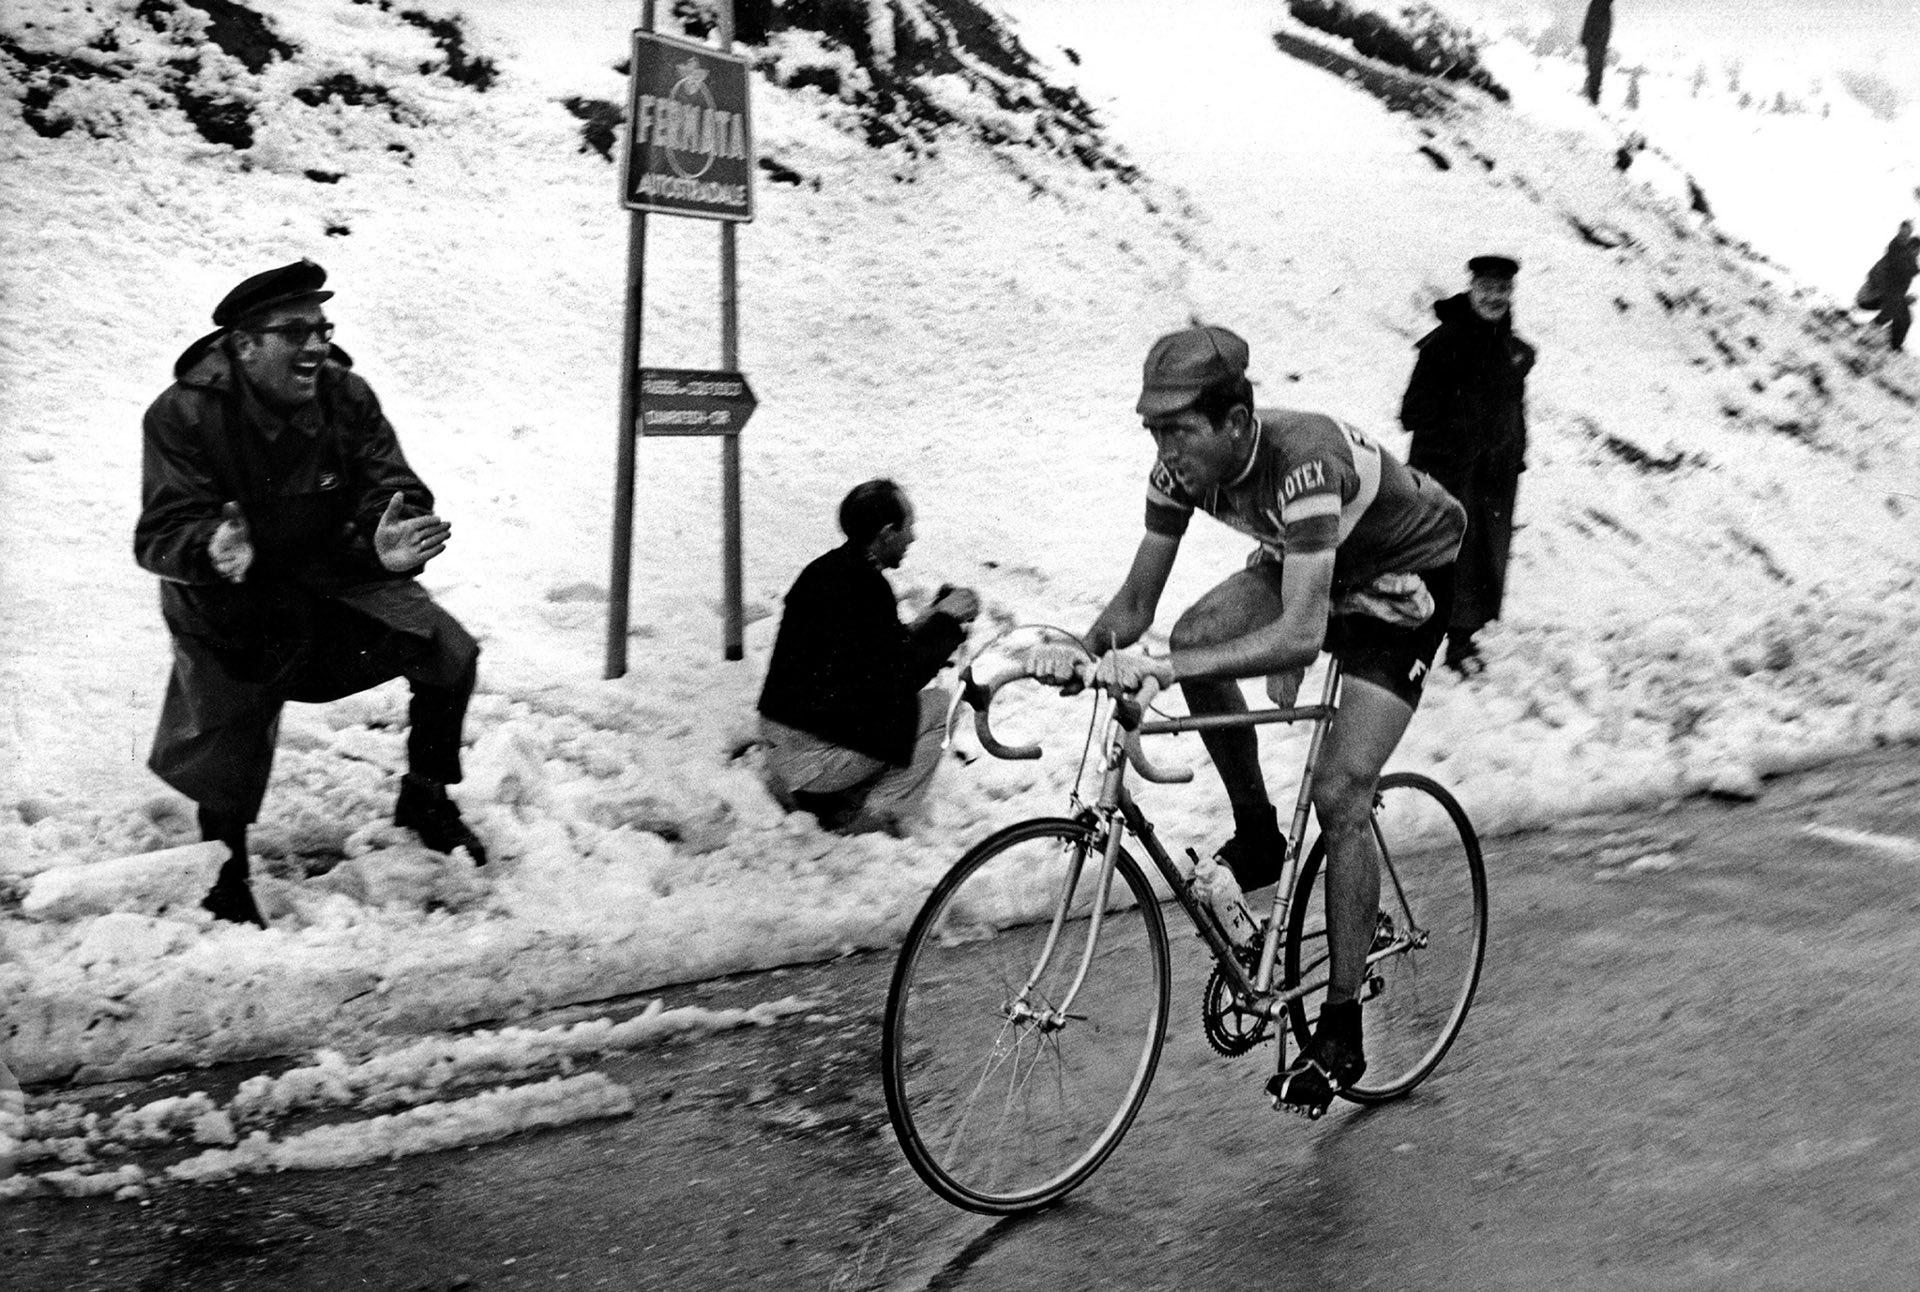 il Giro d'Italia - Italo Zilioli, Giro d'Italia 1969.